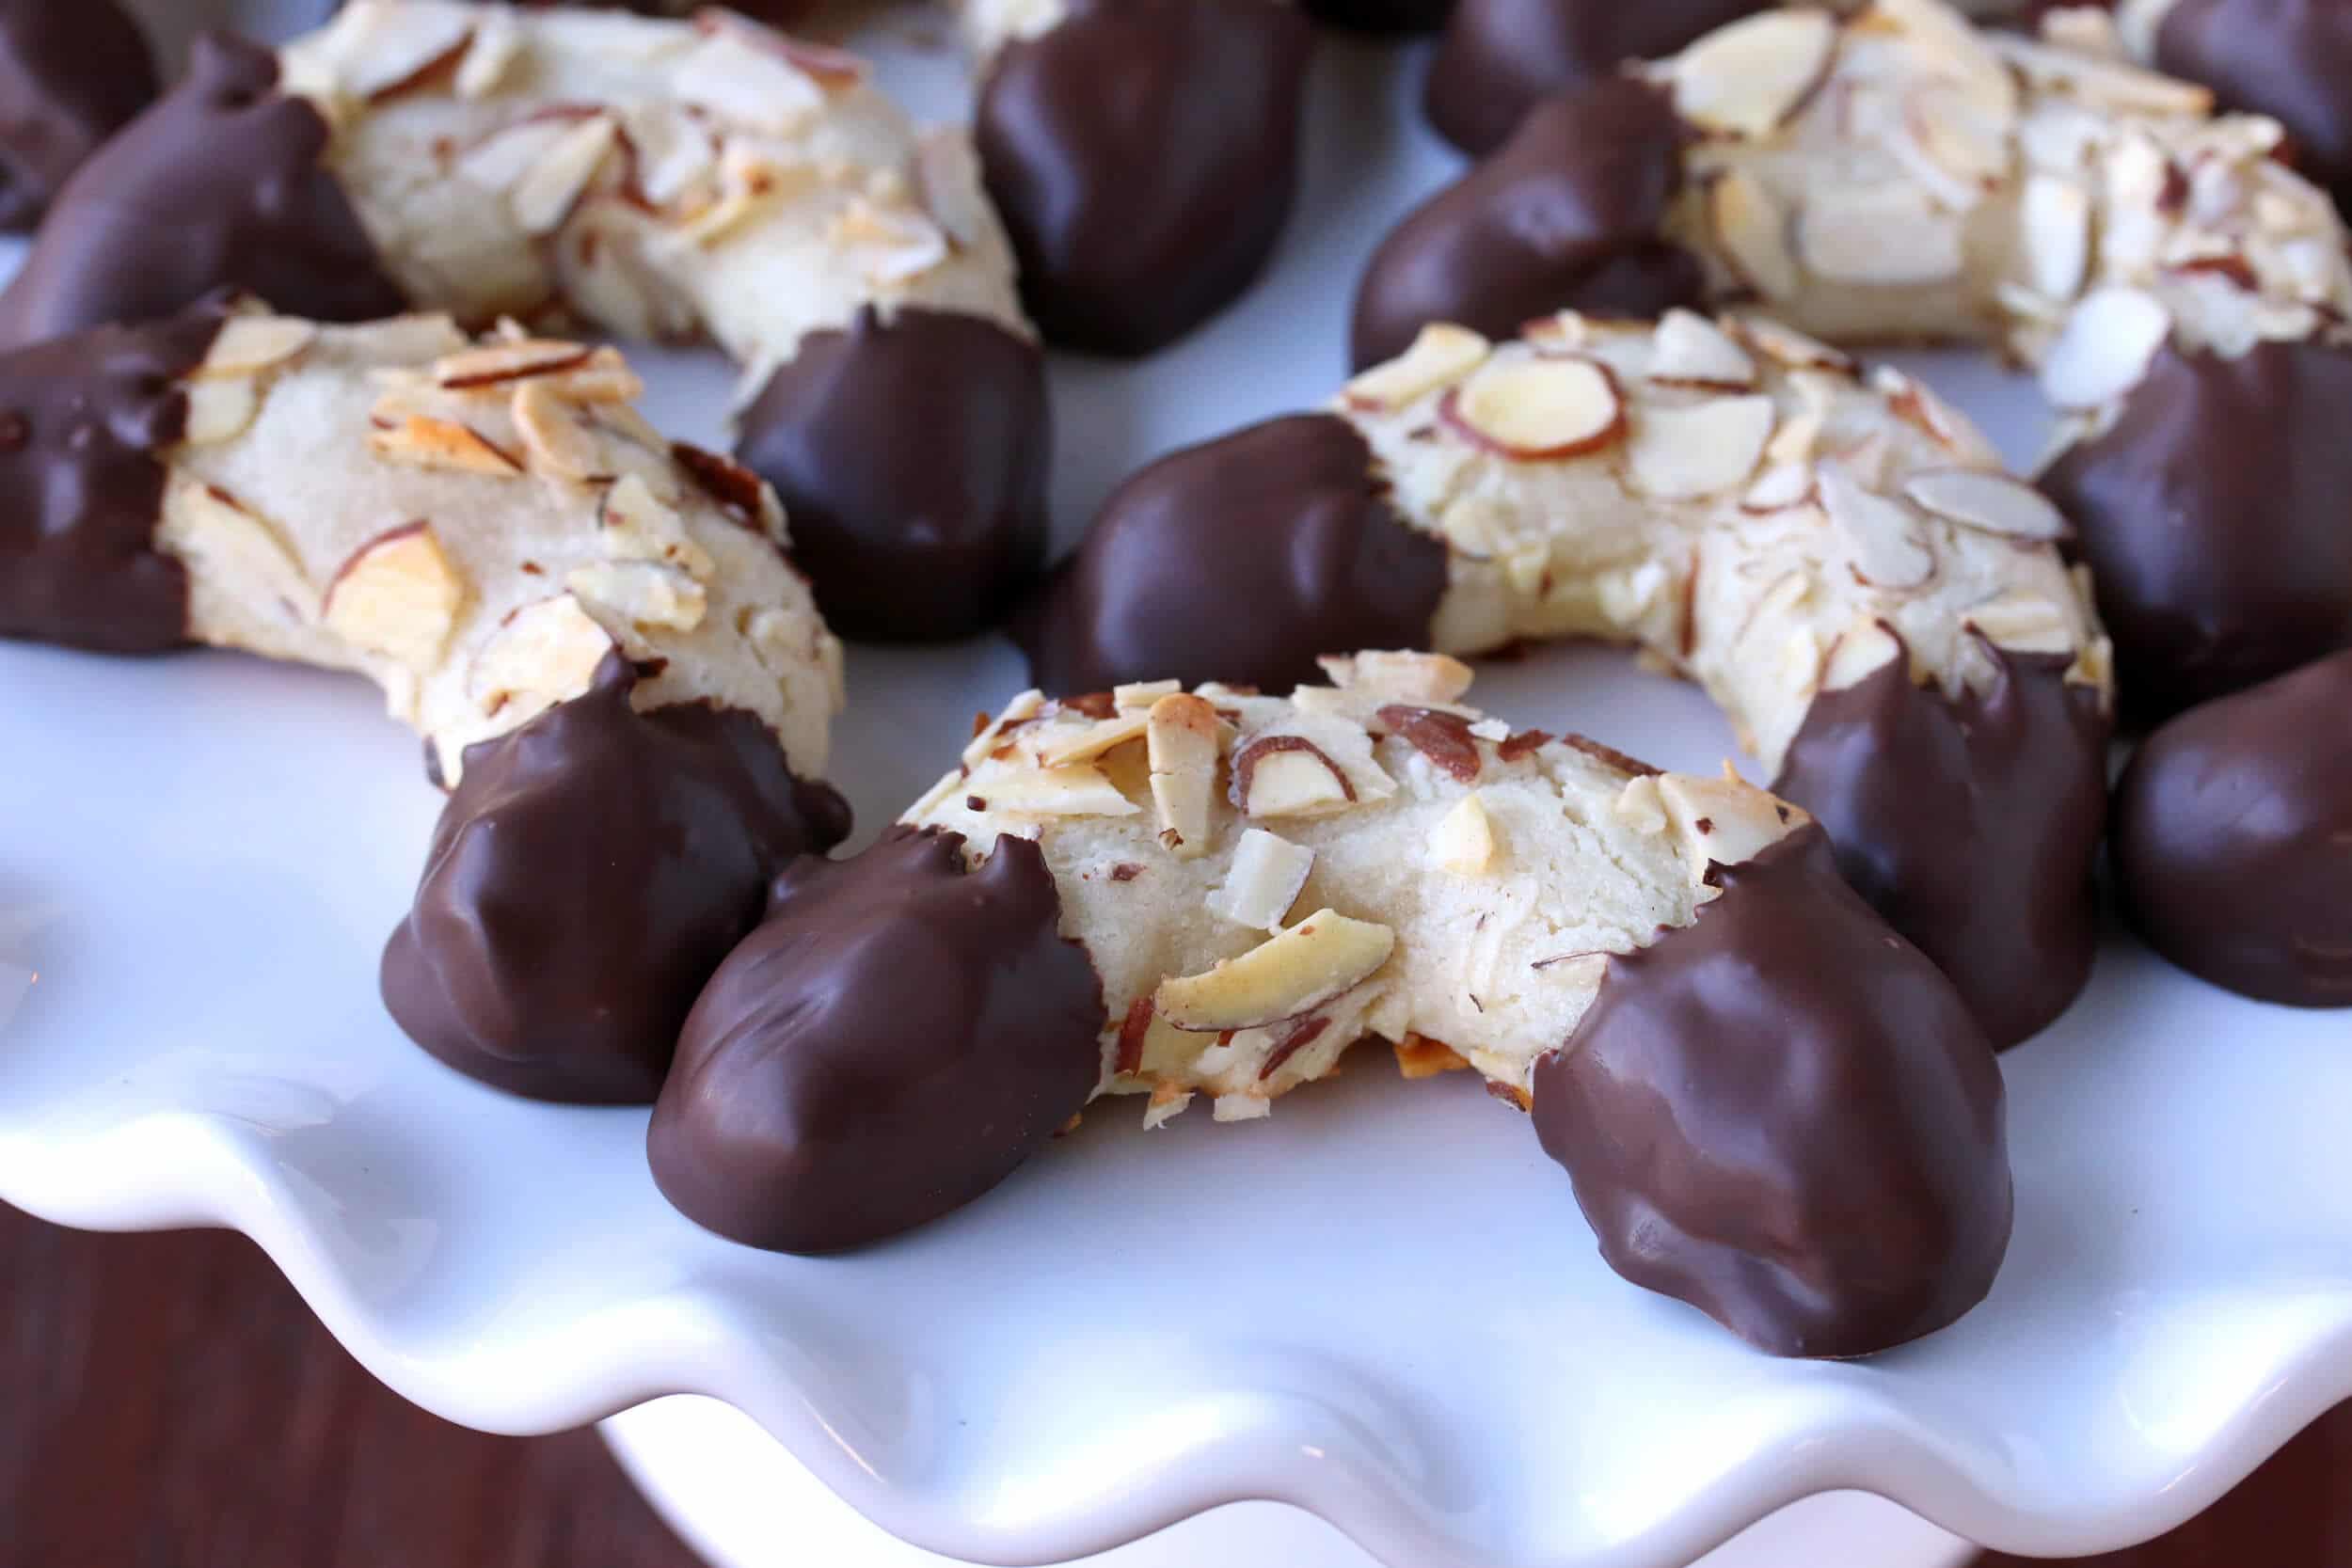 Mandelhörnchen (Chocolate-Dipped Marzipan Almond Horns) - The Daring ...